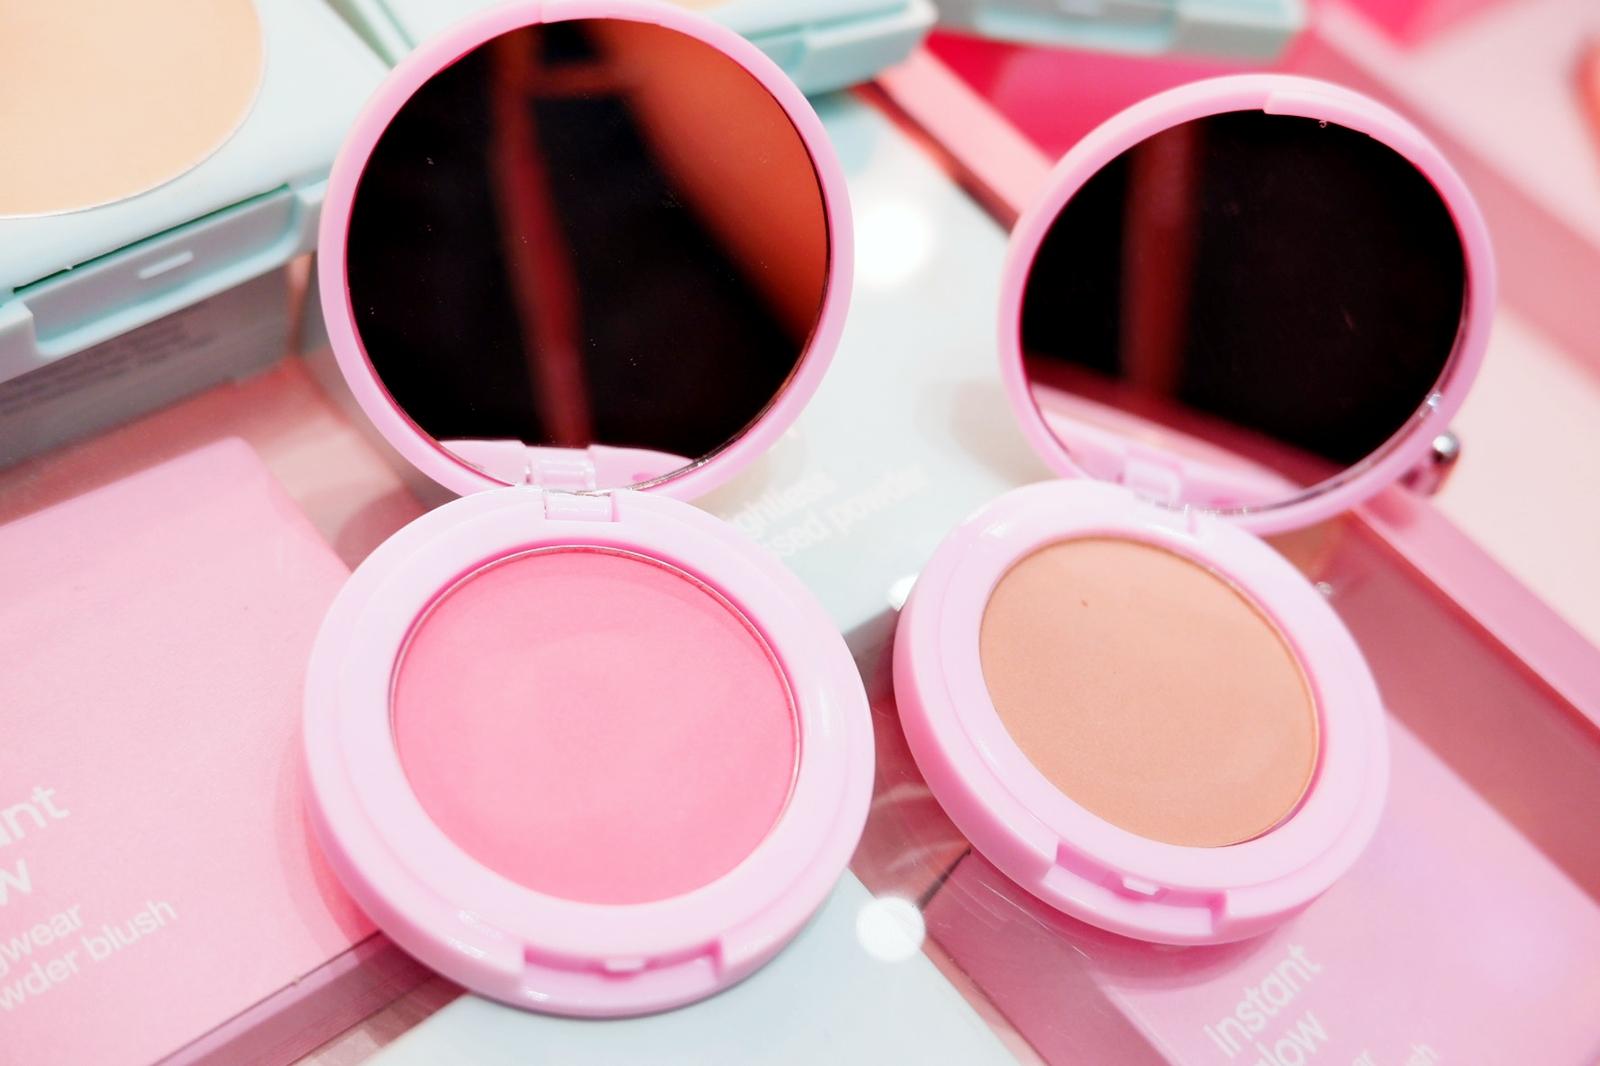 Kathryn Bernardo Generation Happy Skin makeup line